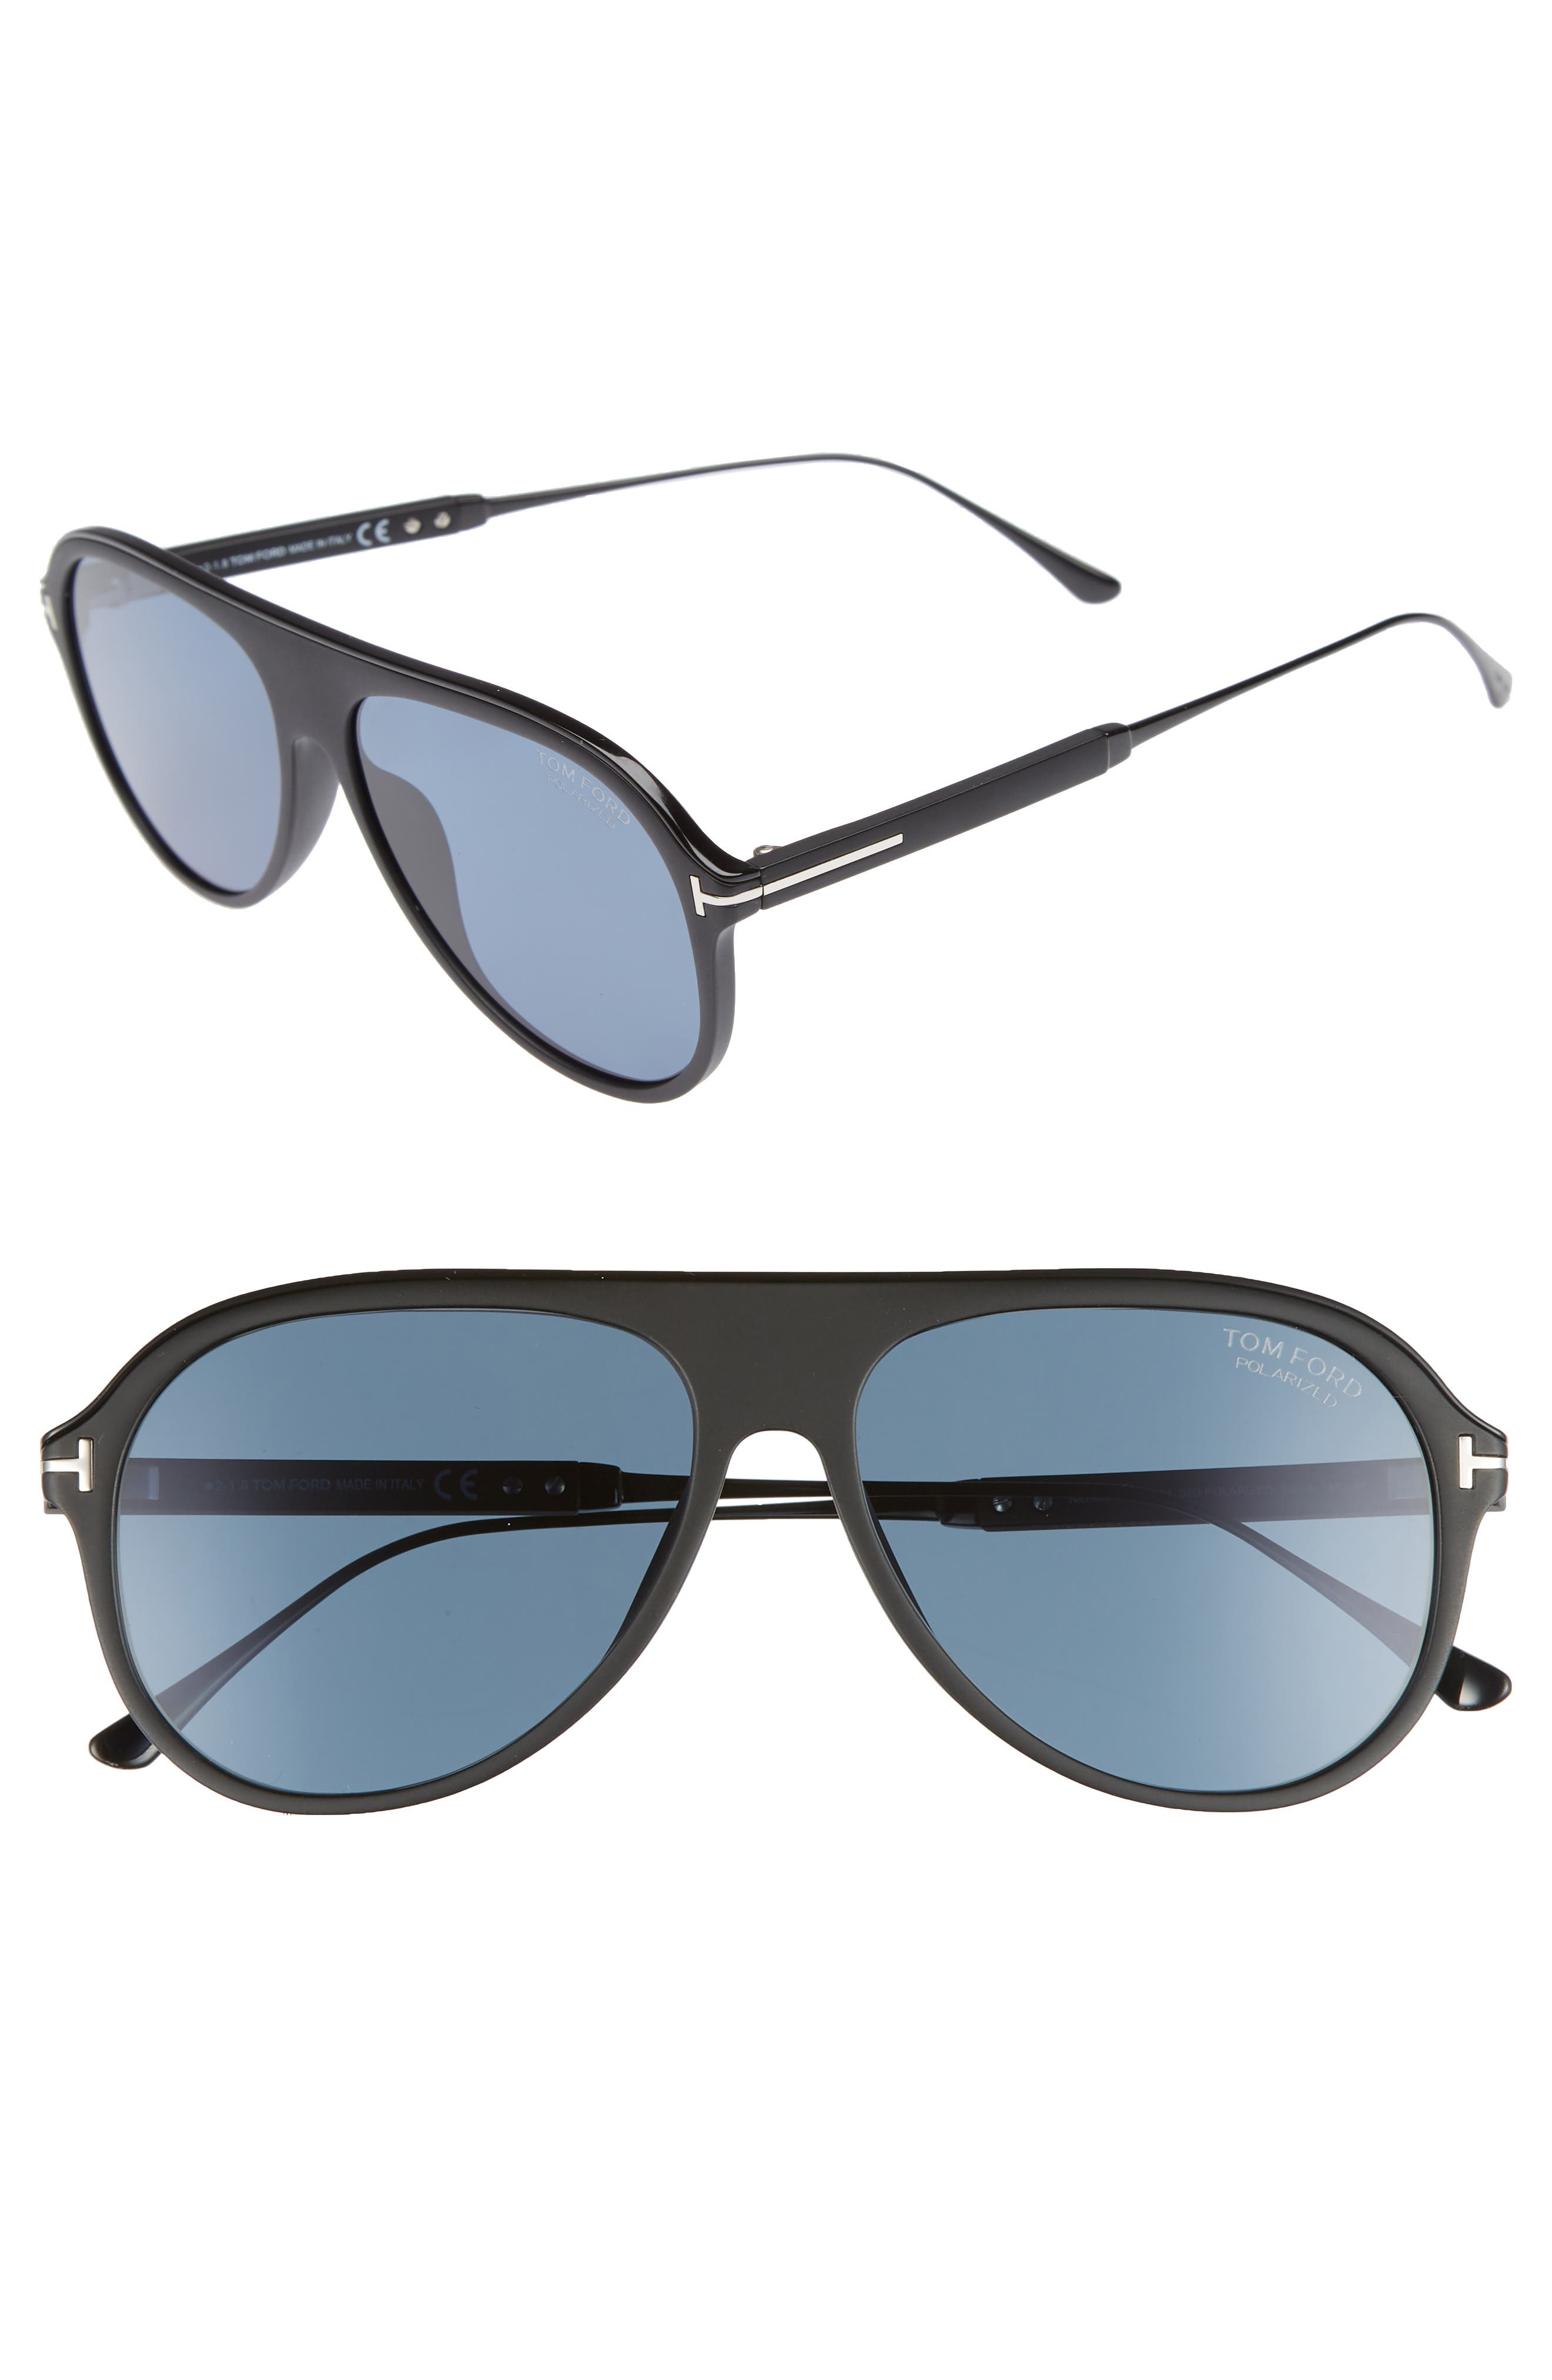 Tom Ford Nicholai 57mm Polarized Sunglasses